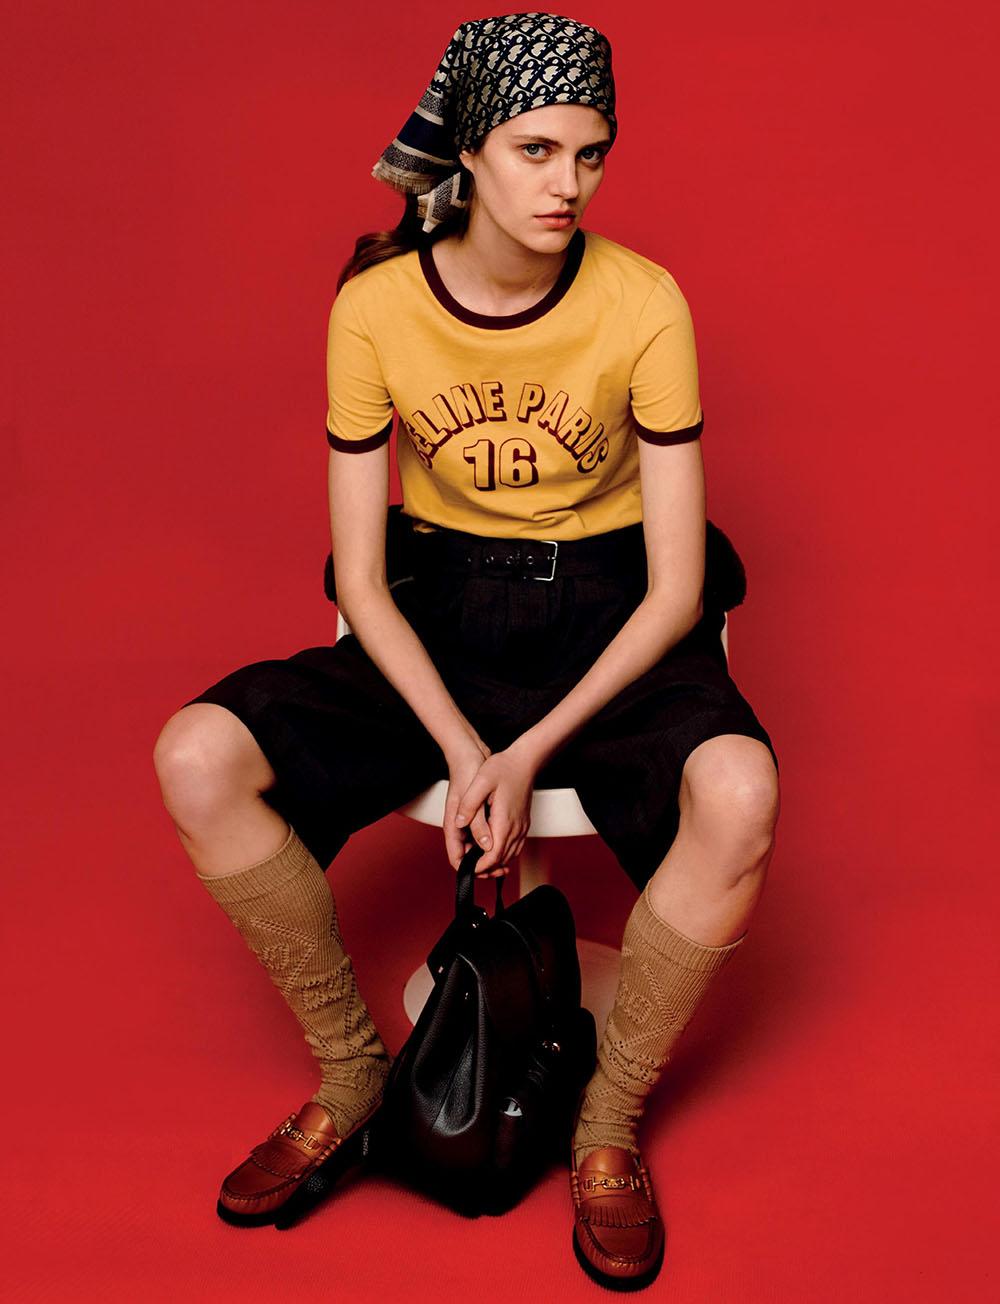 Nataliya Bulycheva by Kharatyan Pavel for Harper's Bazaar Singapore November 2020